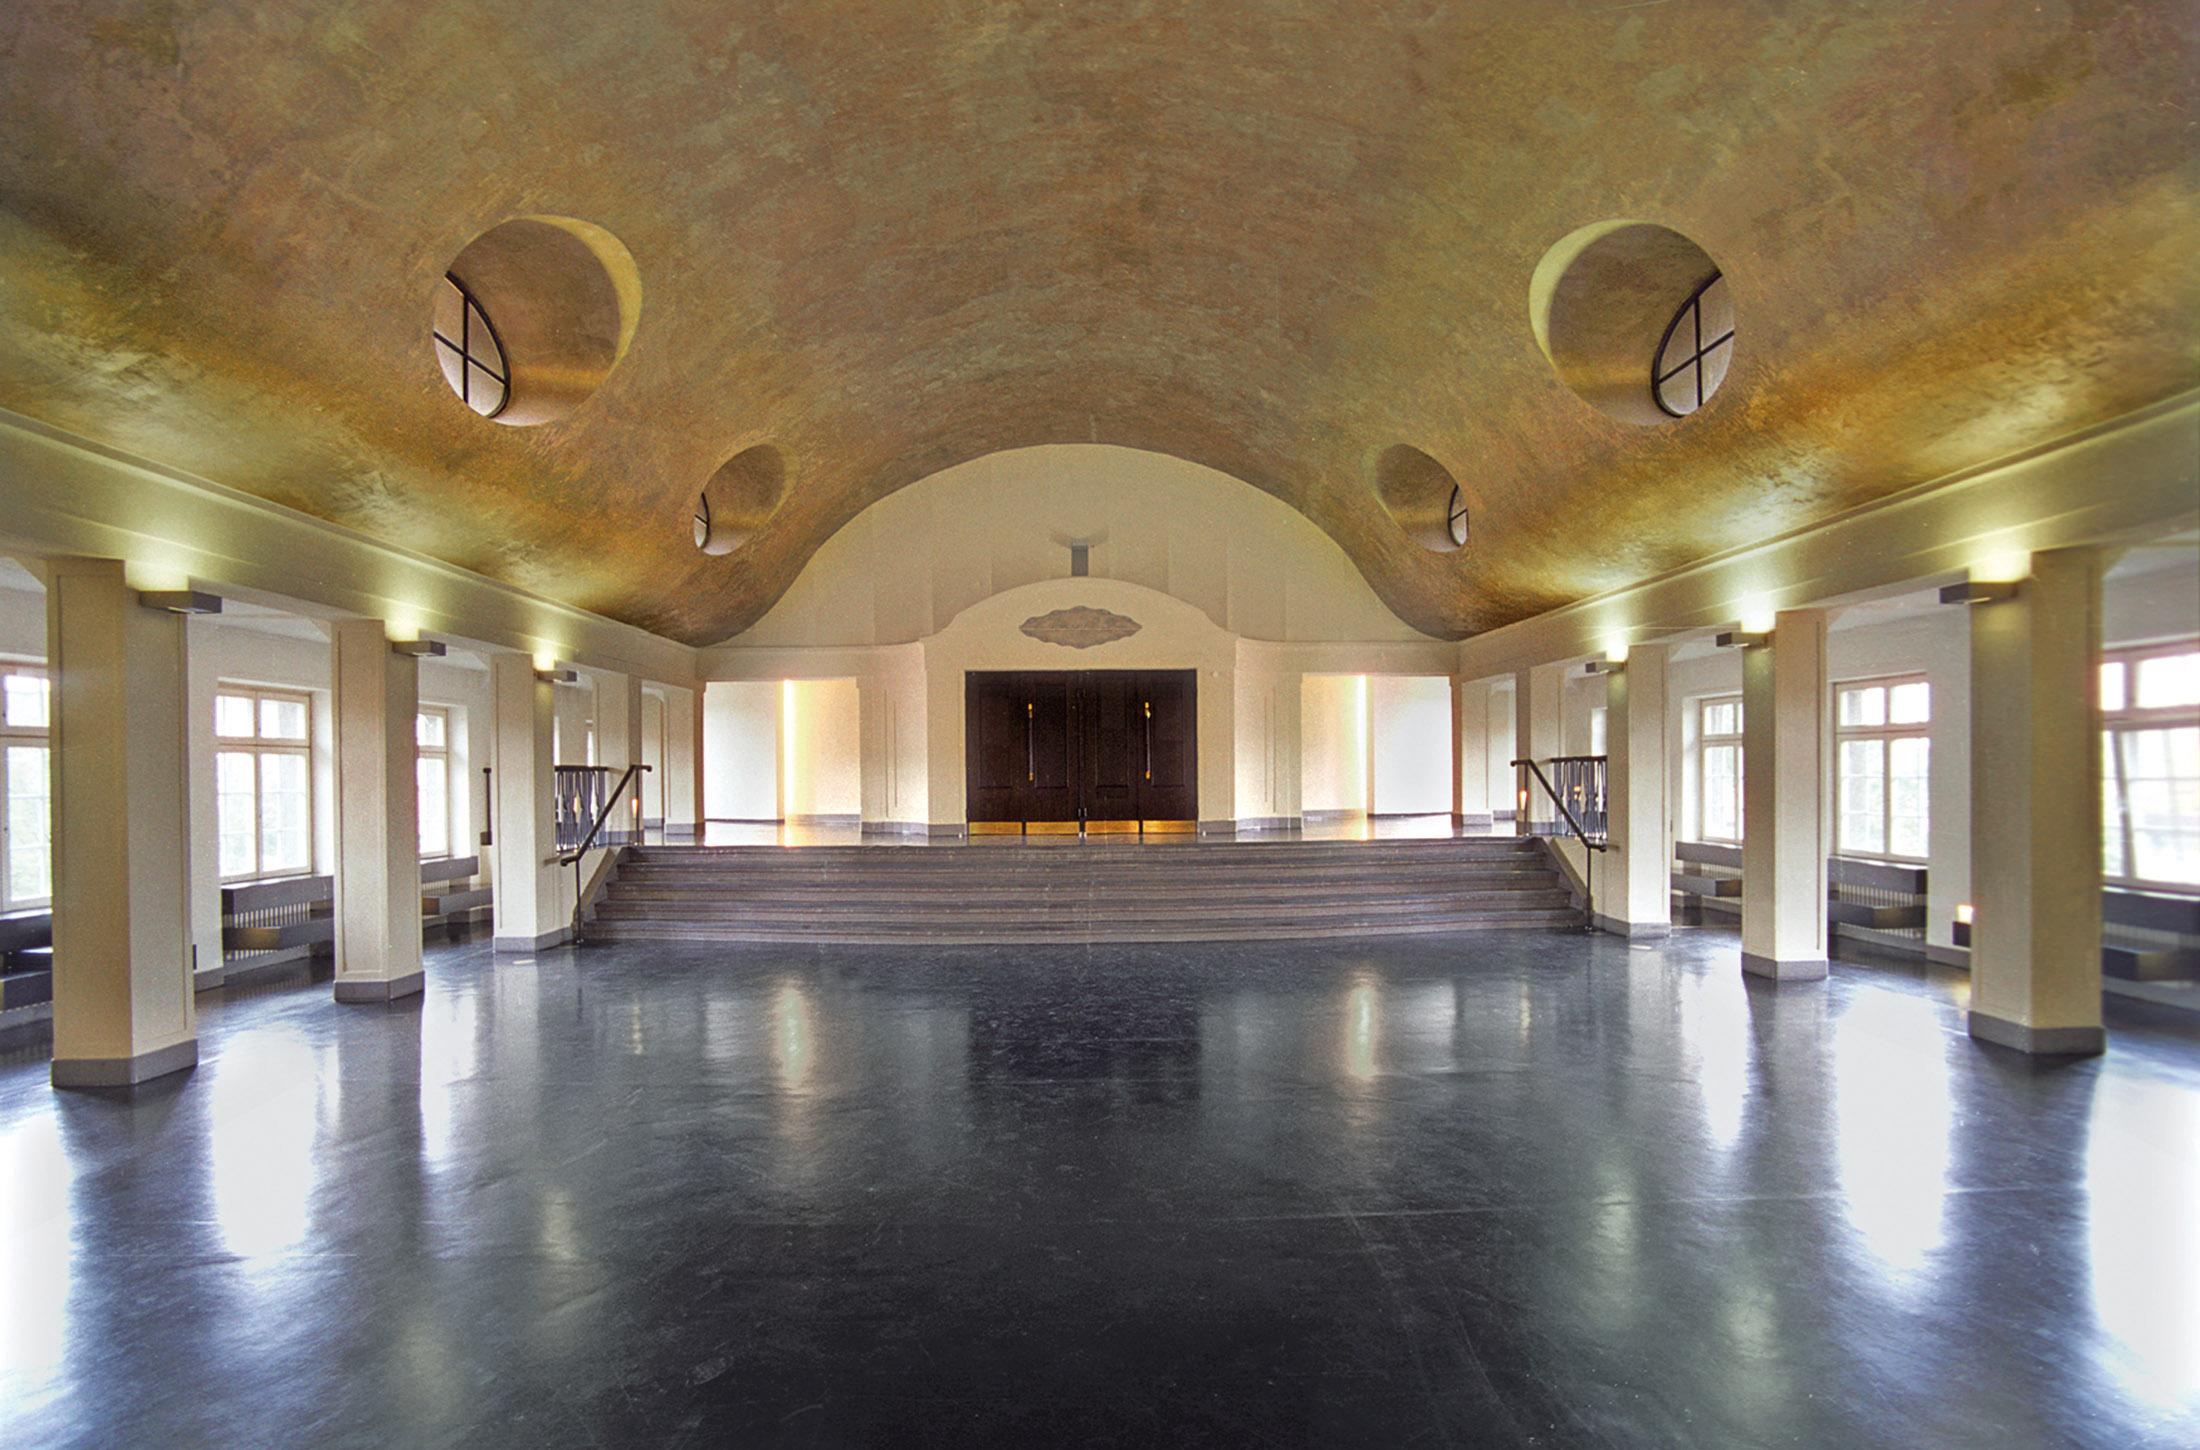 Hauptgeb ude der universit t hamburg dfz architekten for Hamburg universitat